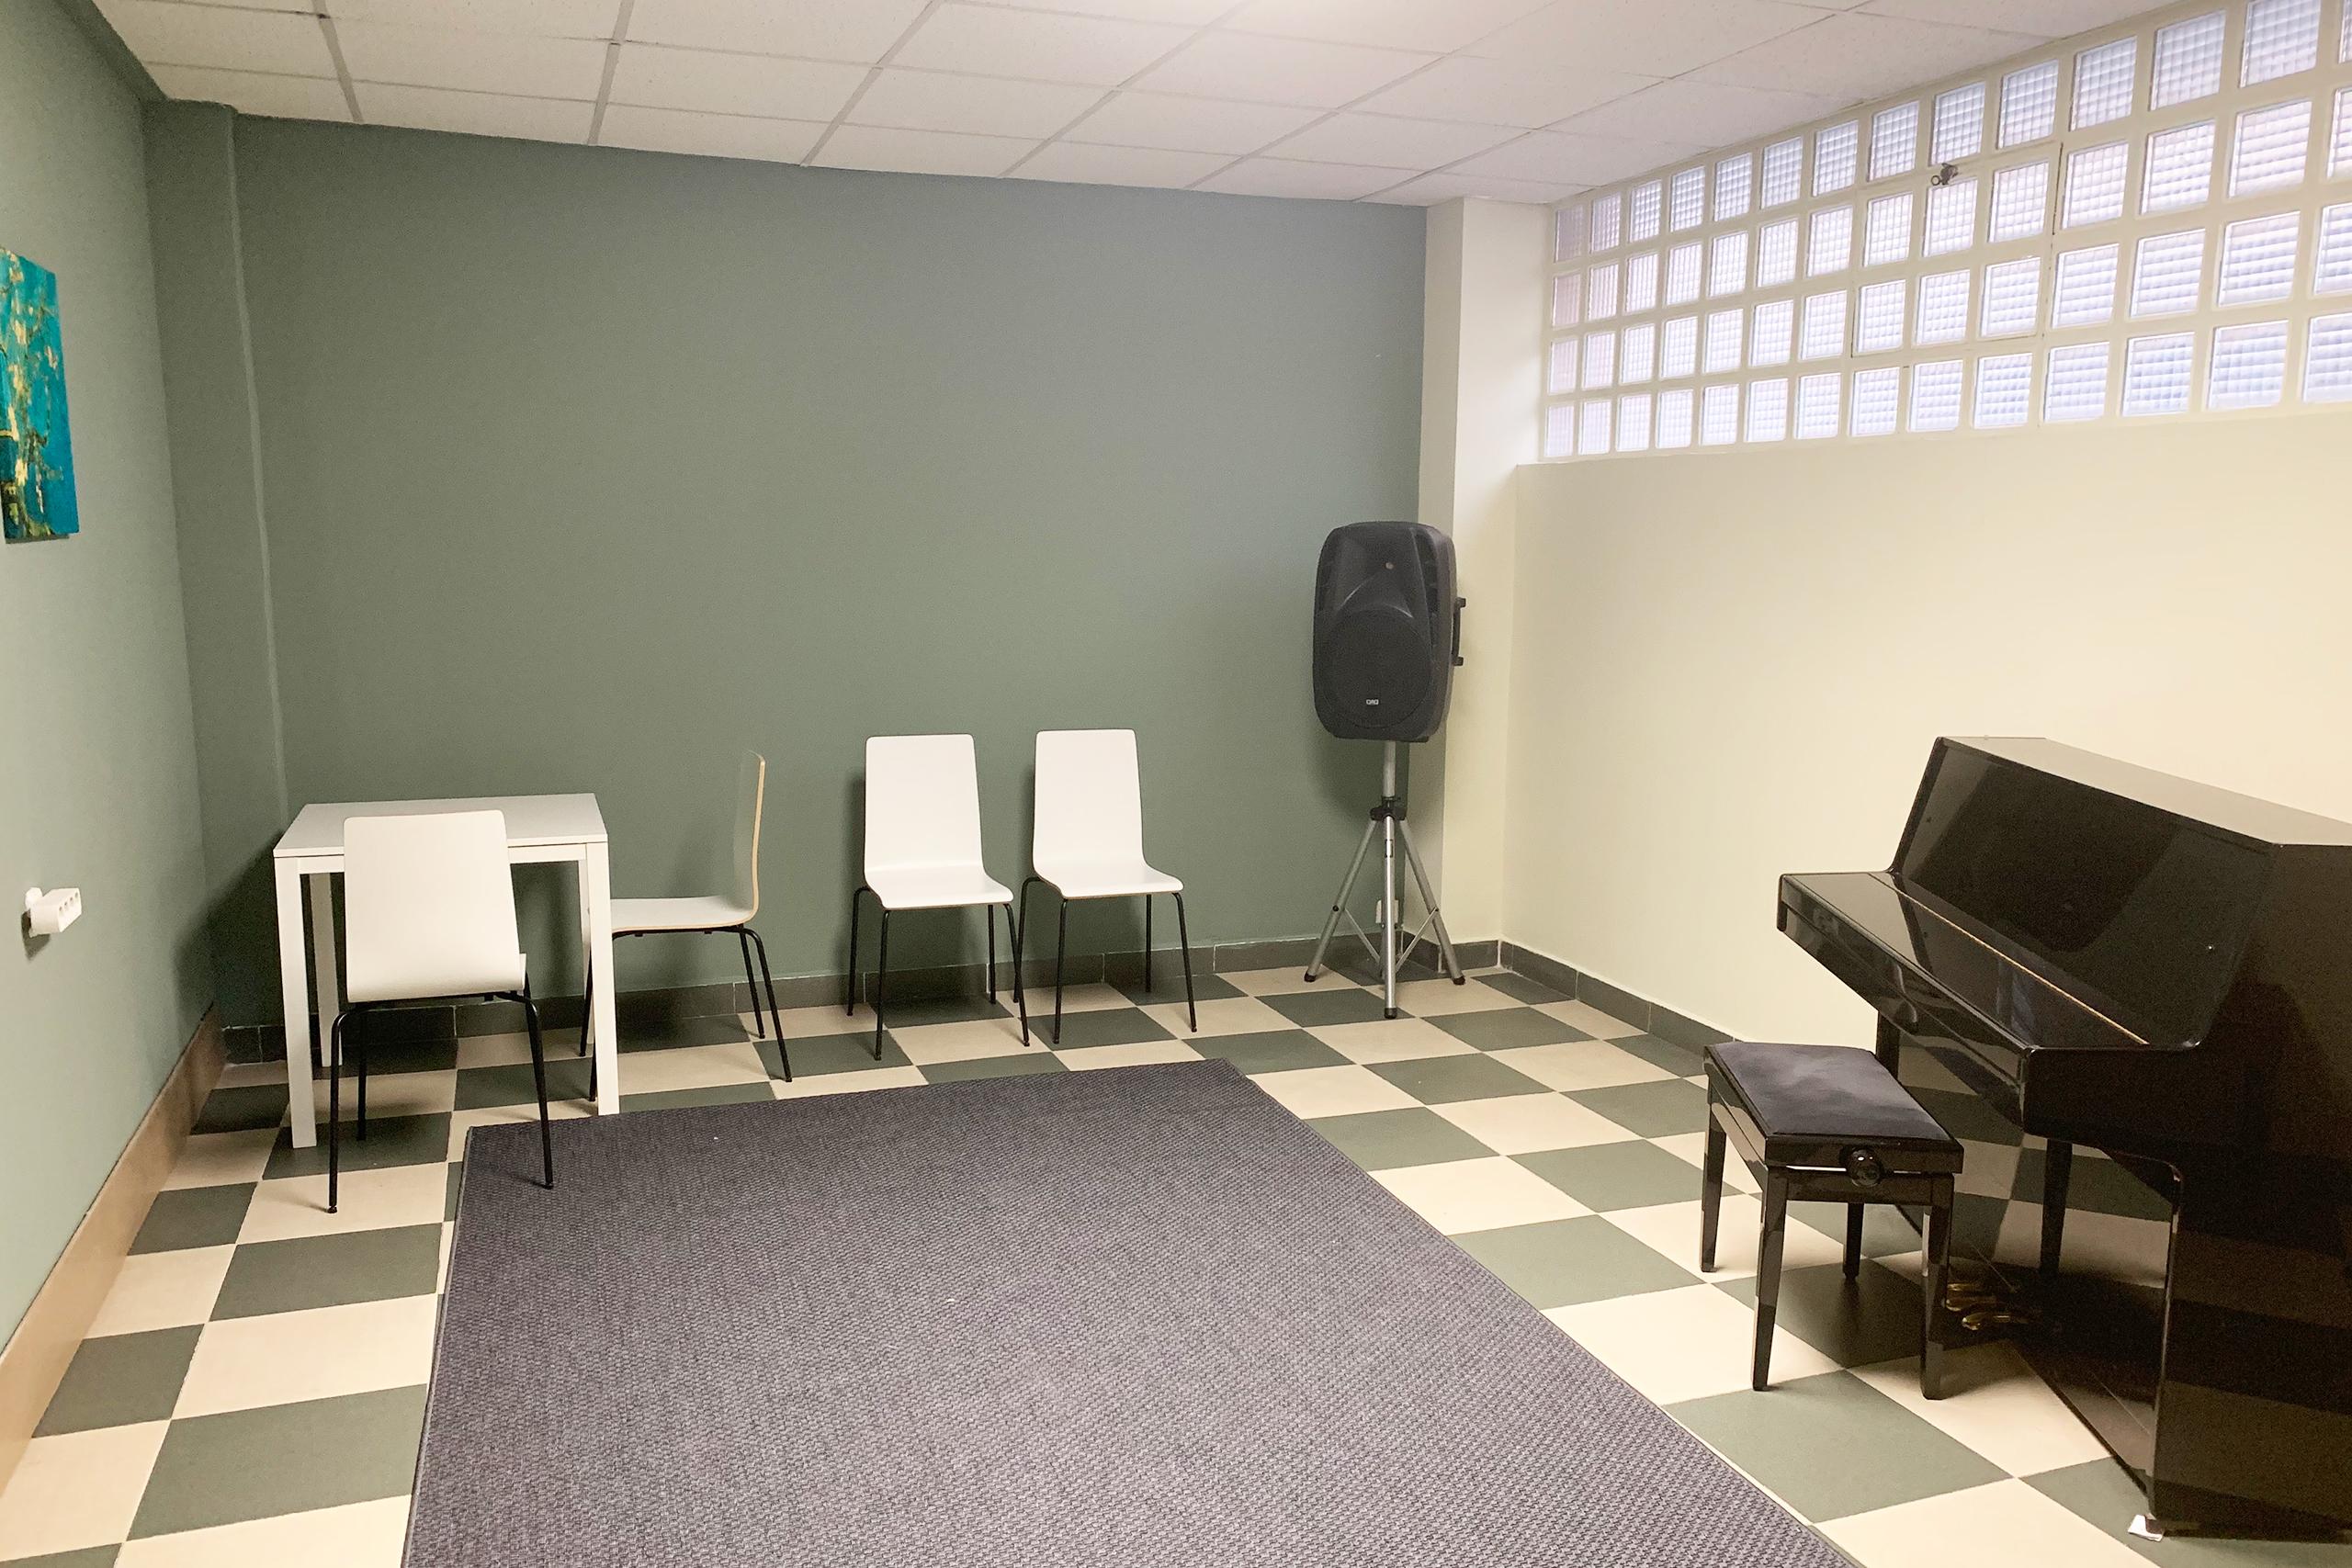 Alquiler de espacios - Aula MedianaTempo Musical